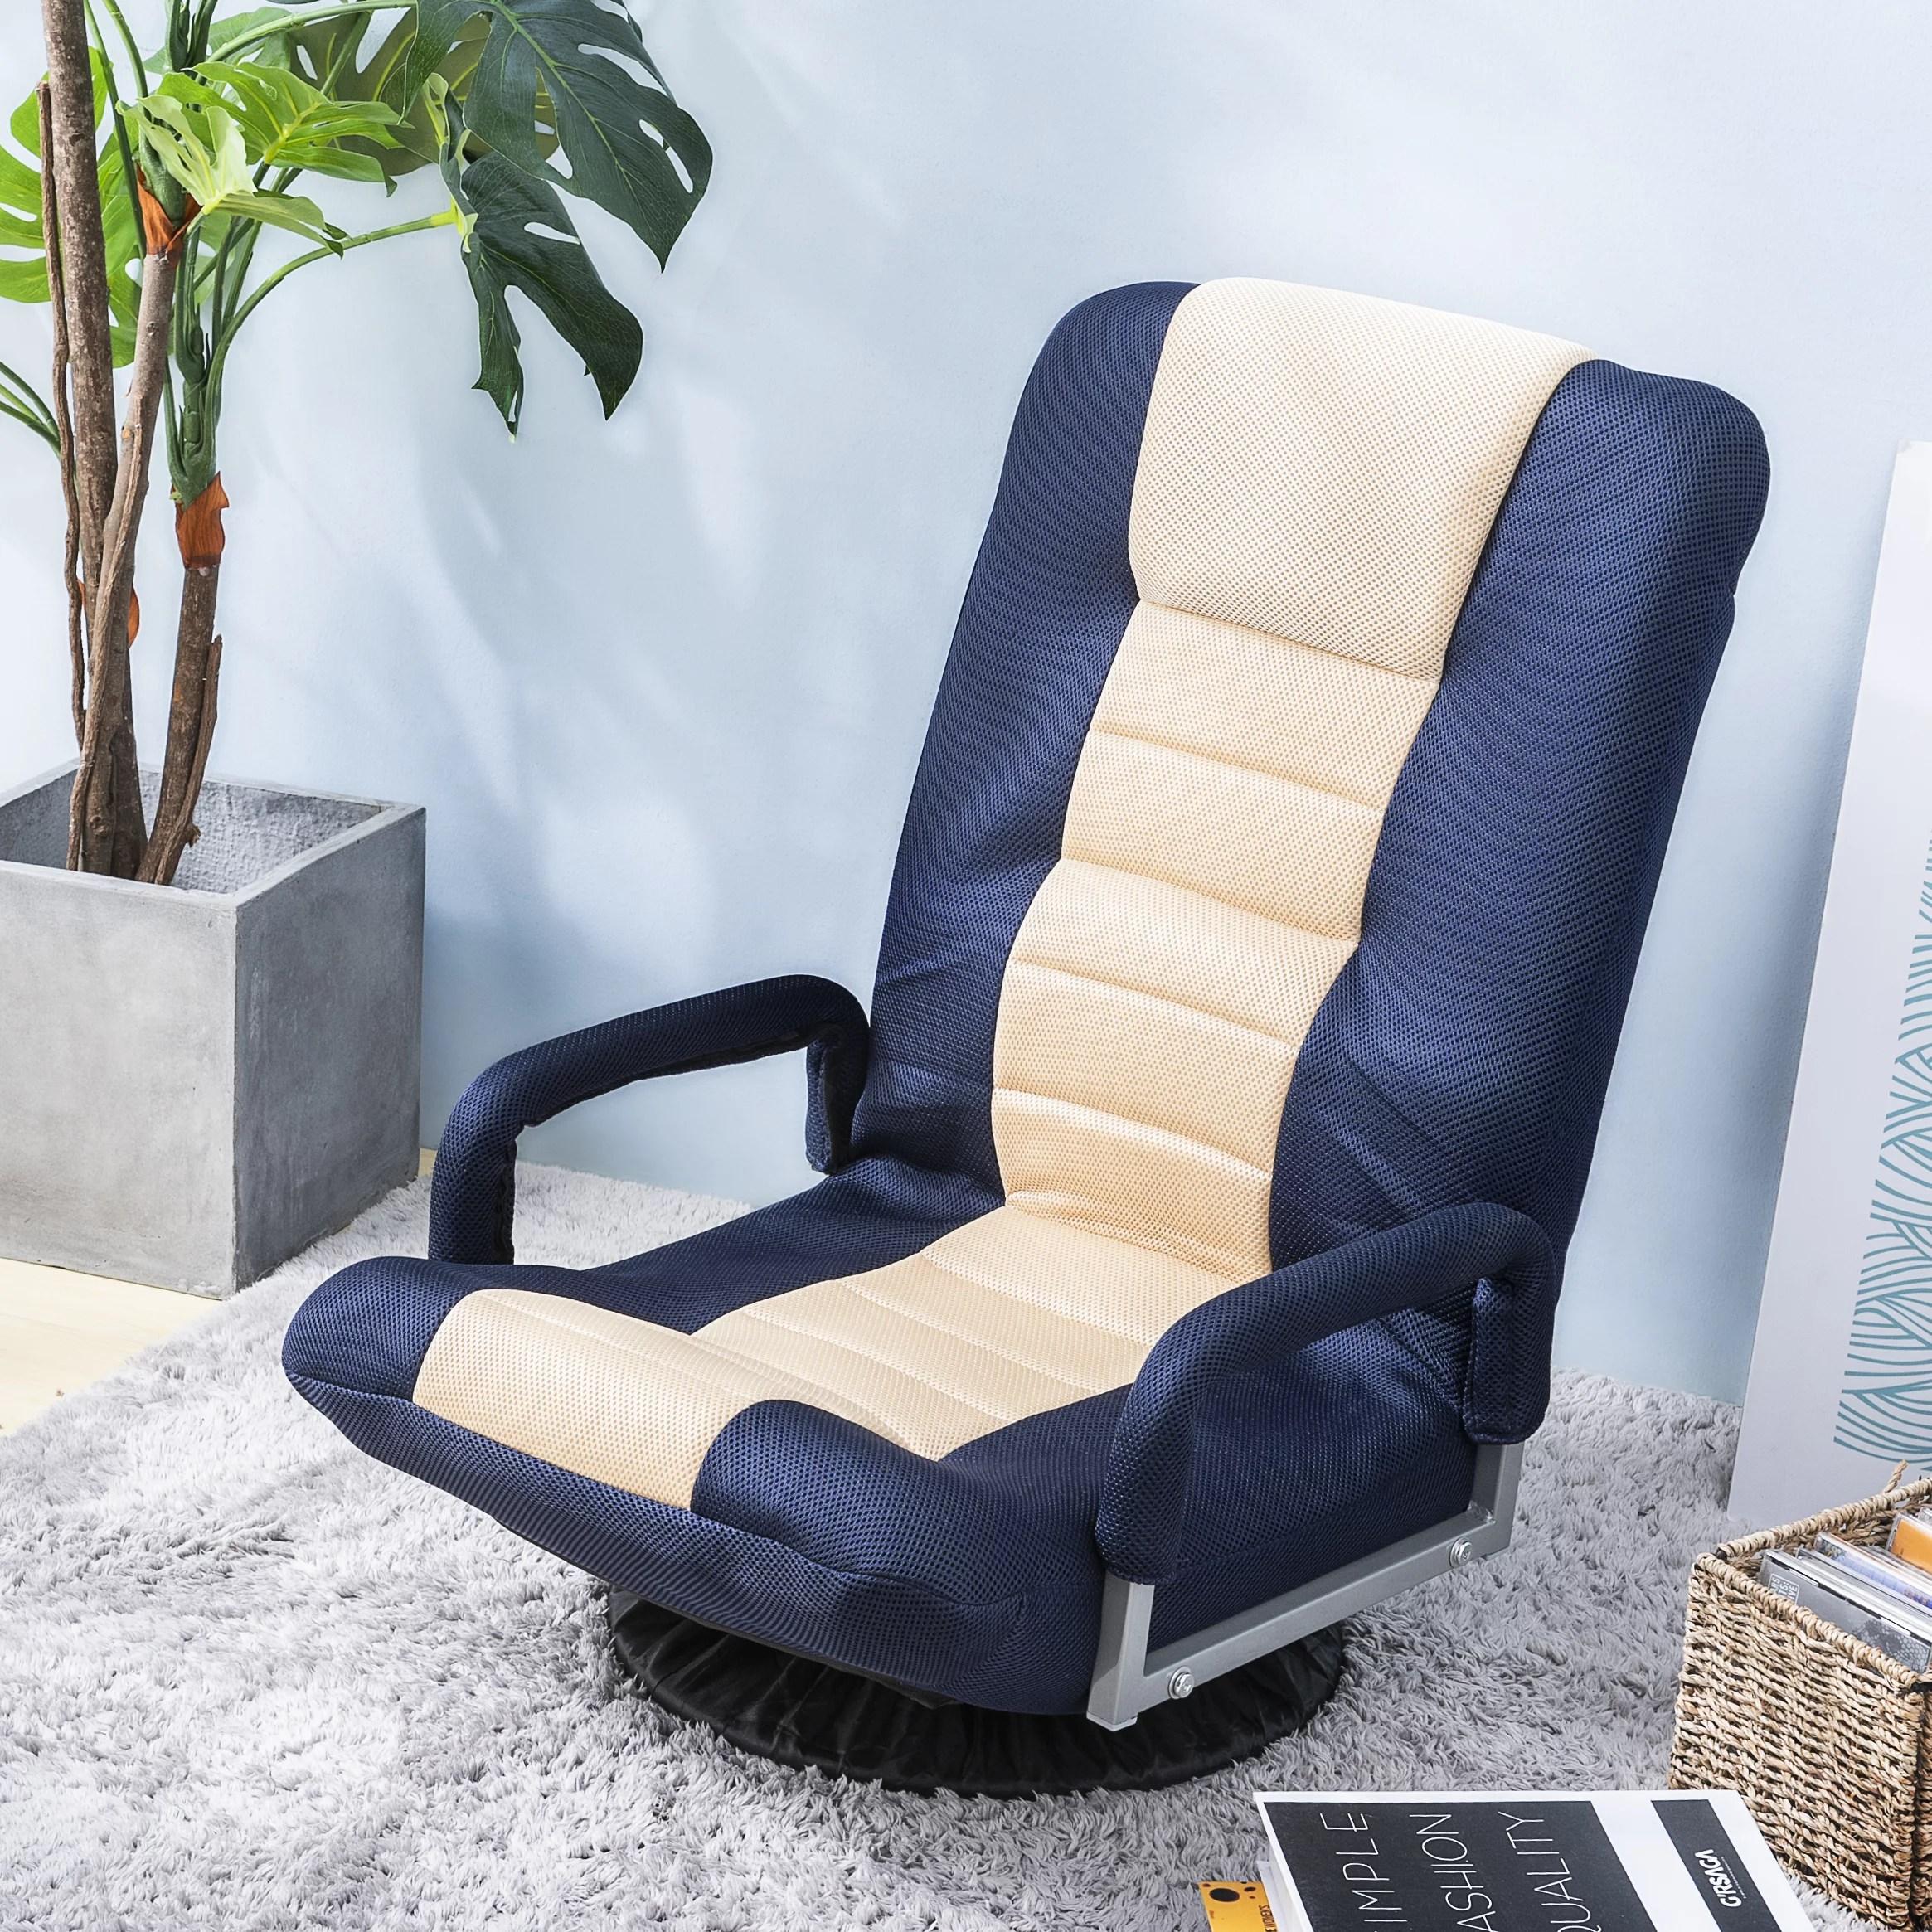 urhomepro floor gaming chair adjustable 7 position swivel Kids Floor Chair id=29260